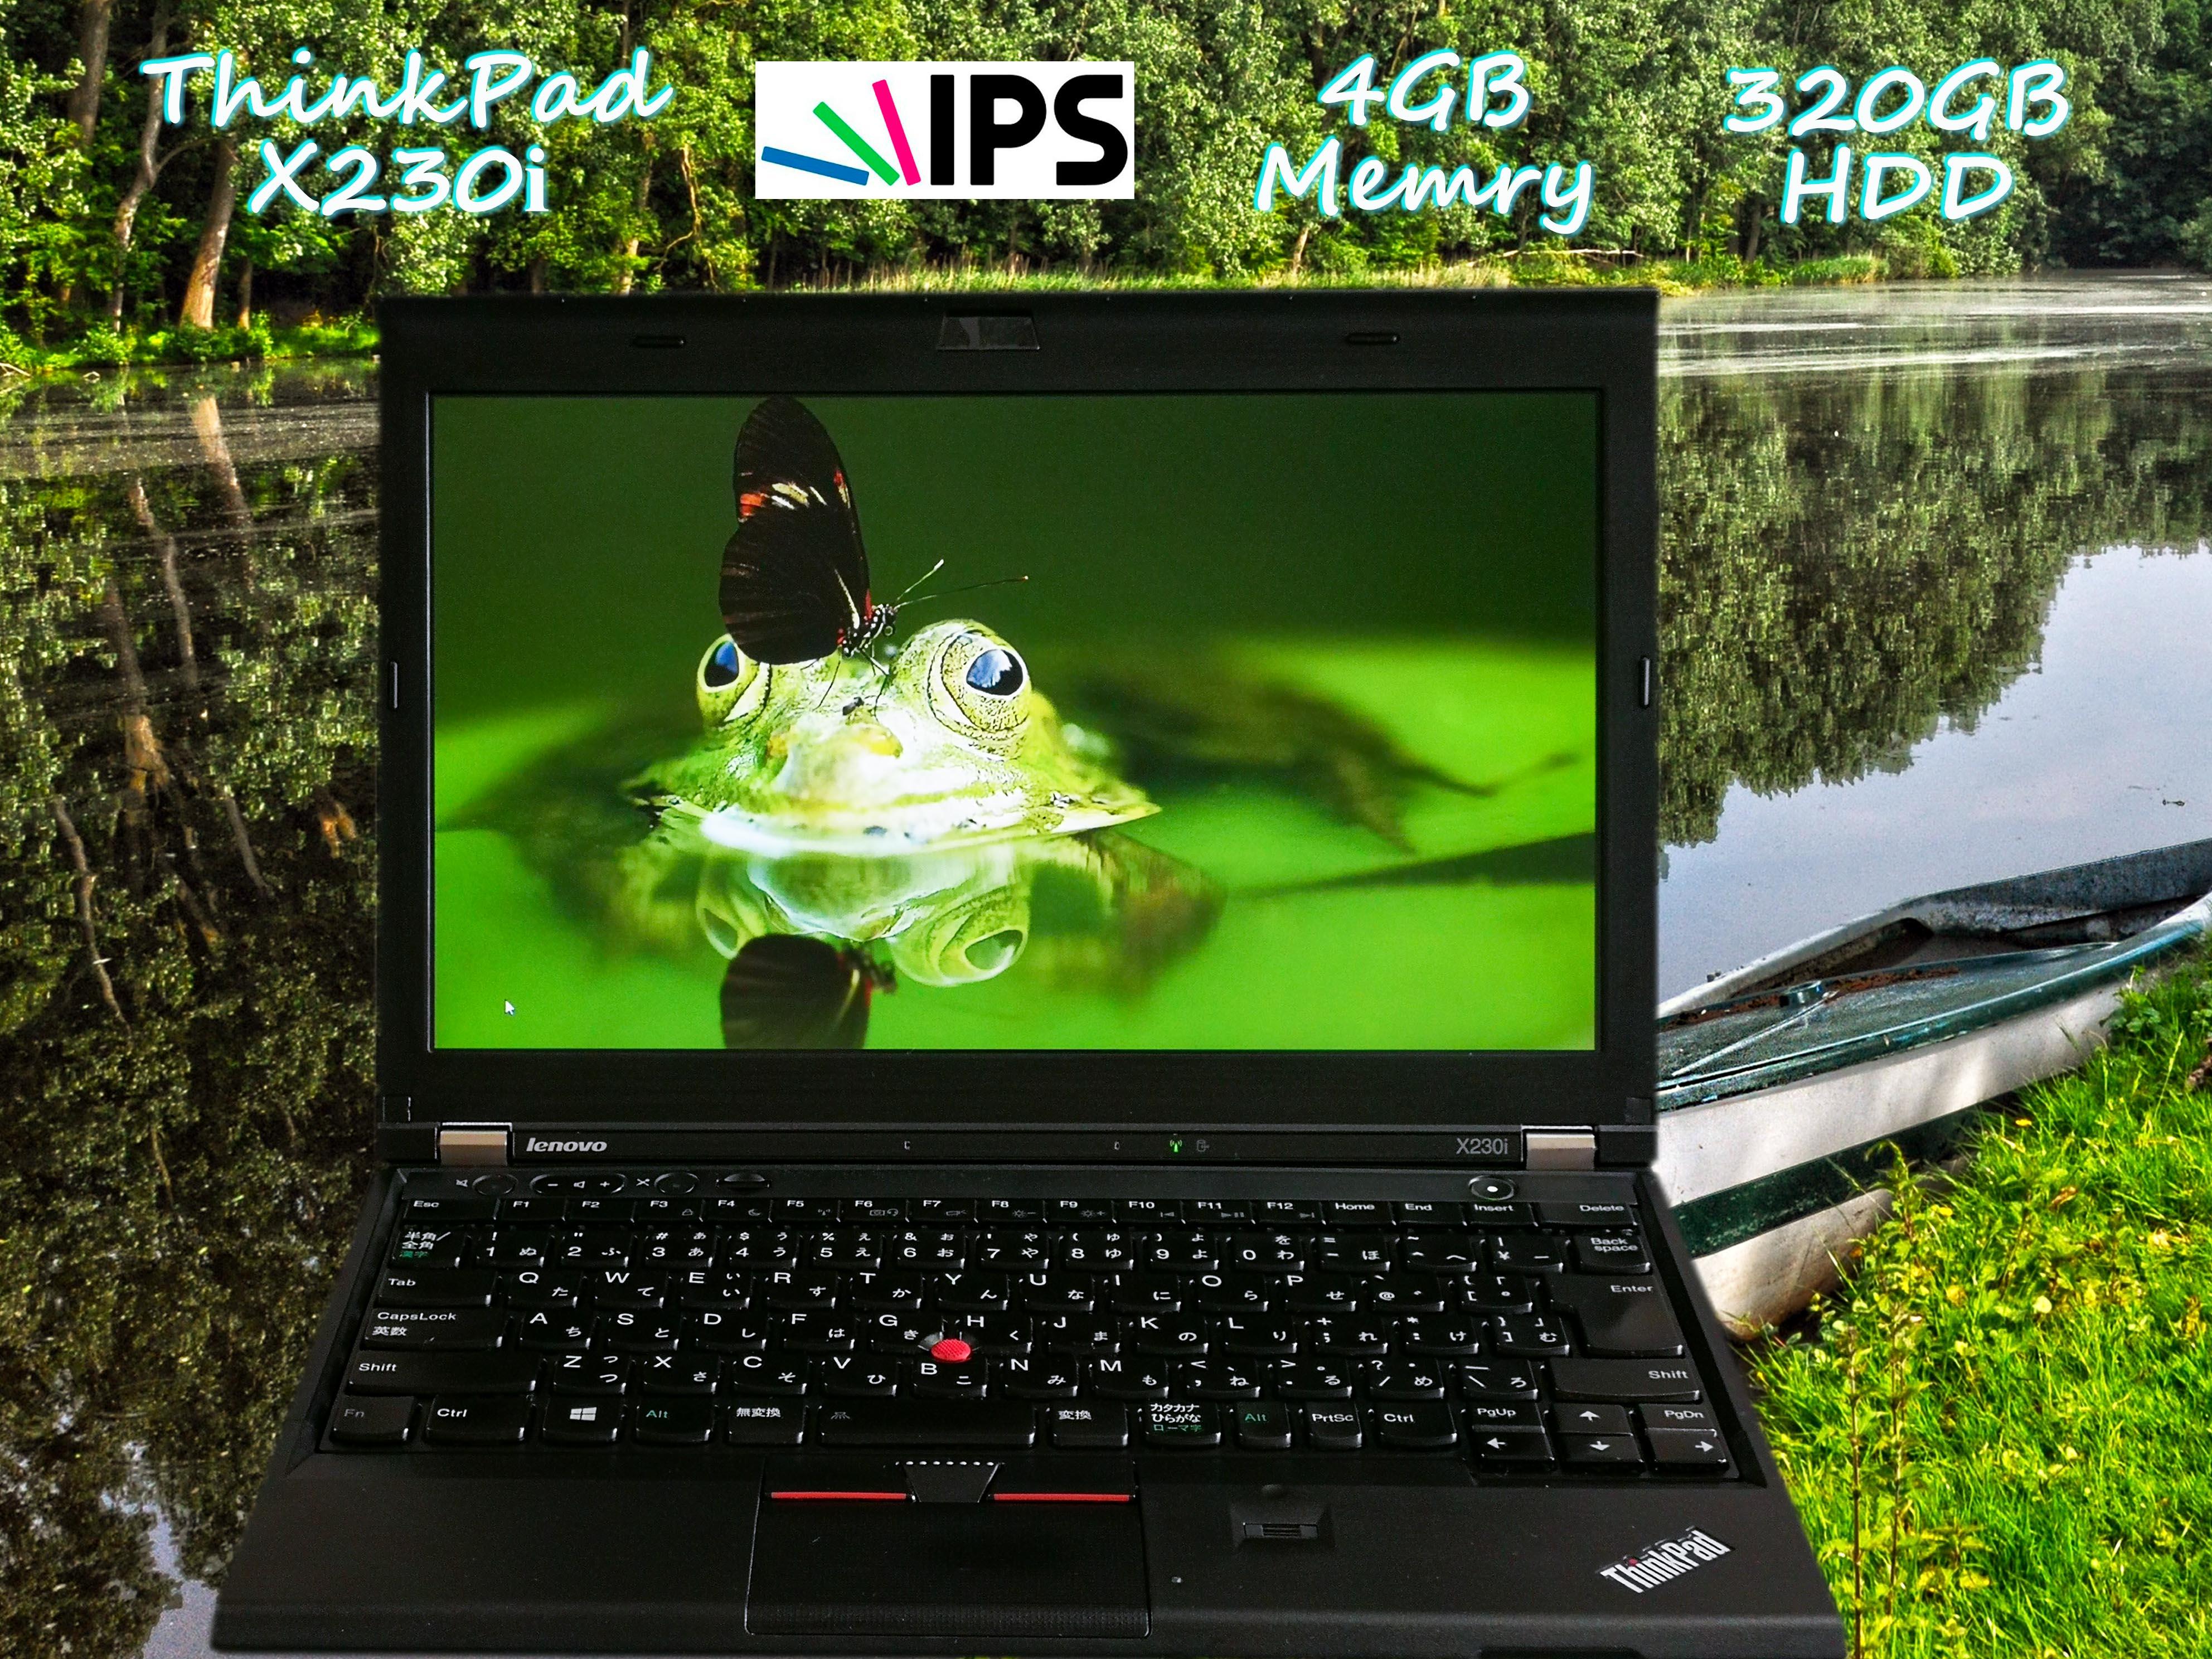 Lenovo ThinkPad X230i i3 4GB HDD(320GB) 画面(IPS HD 12.5  1366×768) バッテリ(持続時間5h19m)  指紋 Win10  USBカメラ付き